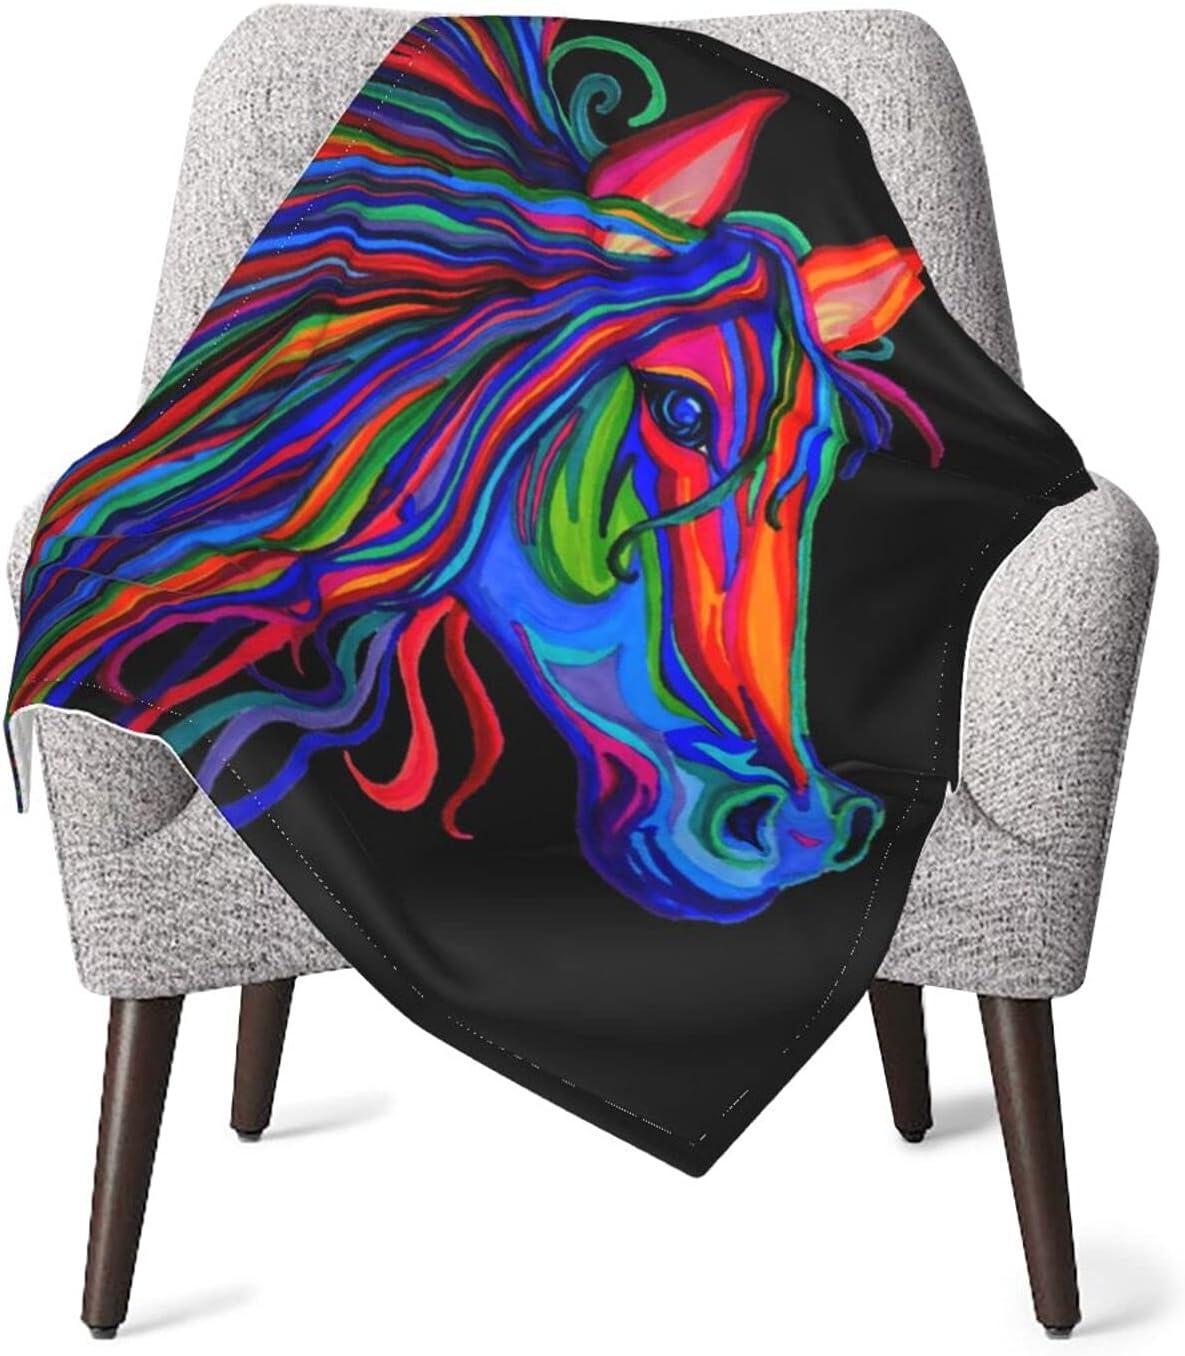 JZDACH Unisex Baby Receiving Rainbow Blankets Horse Wild Max 80% OFF I Popular brand Head